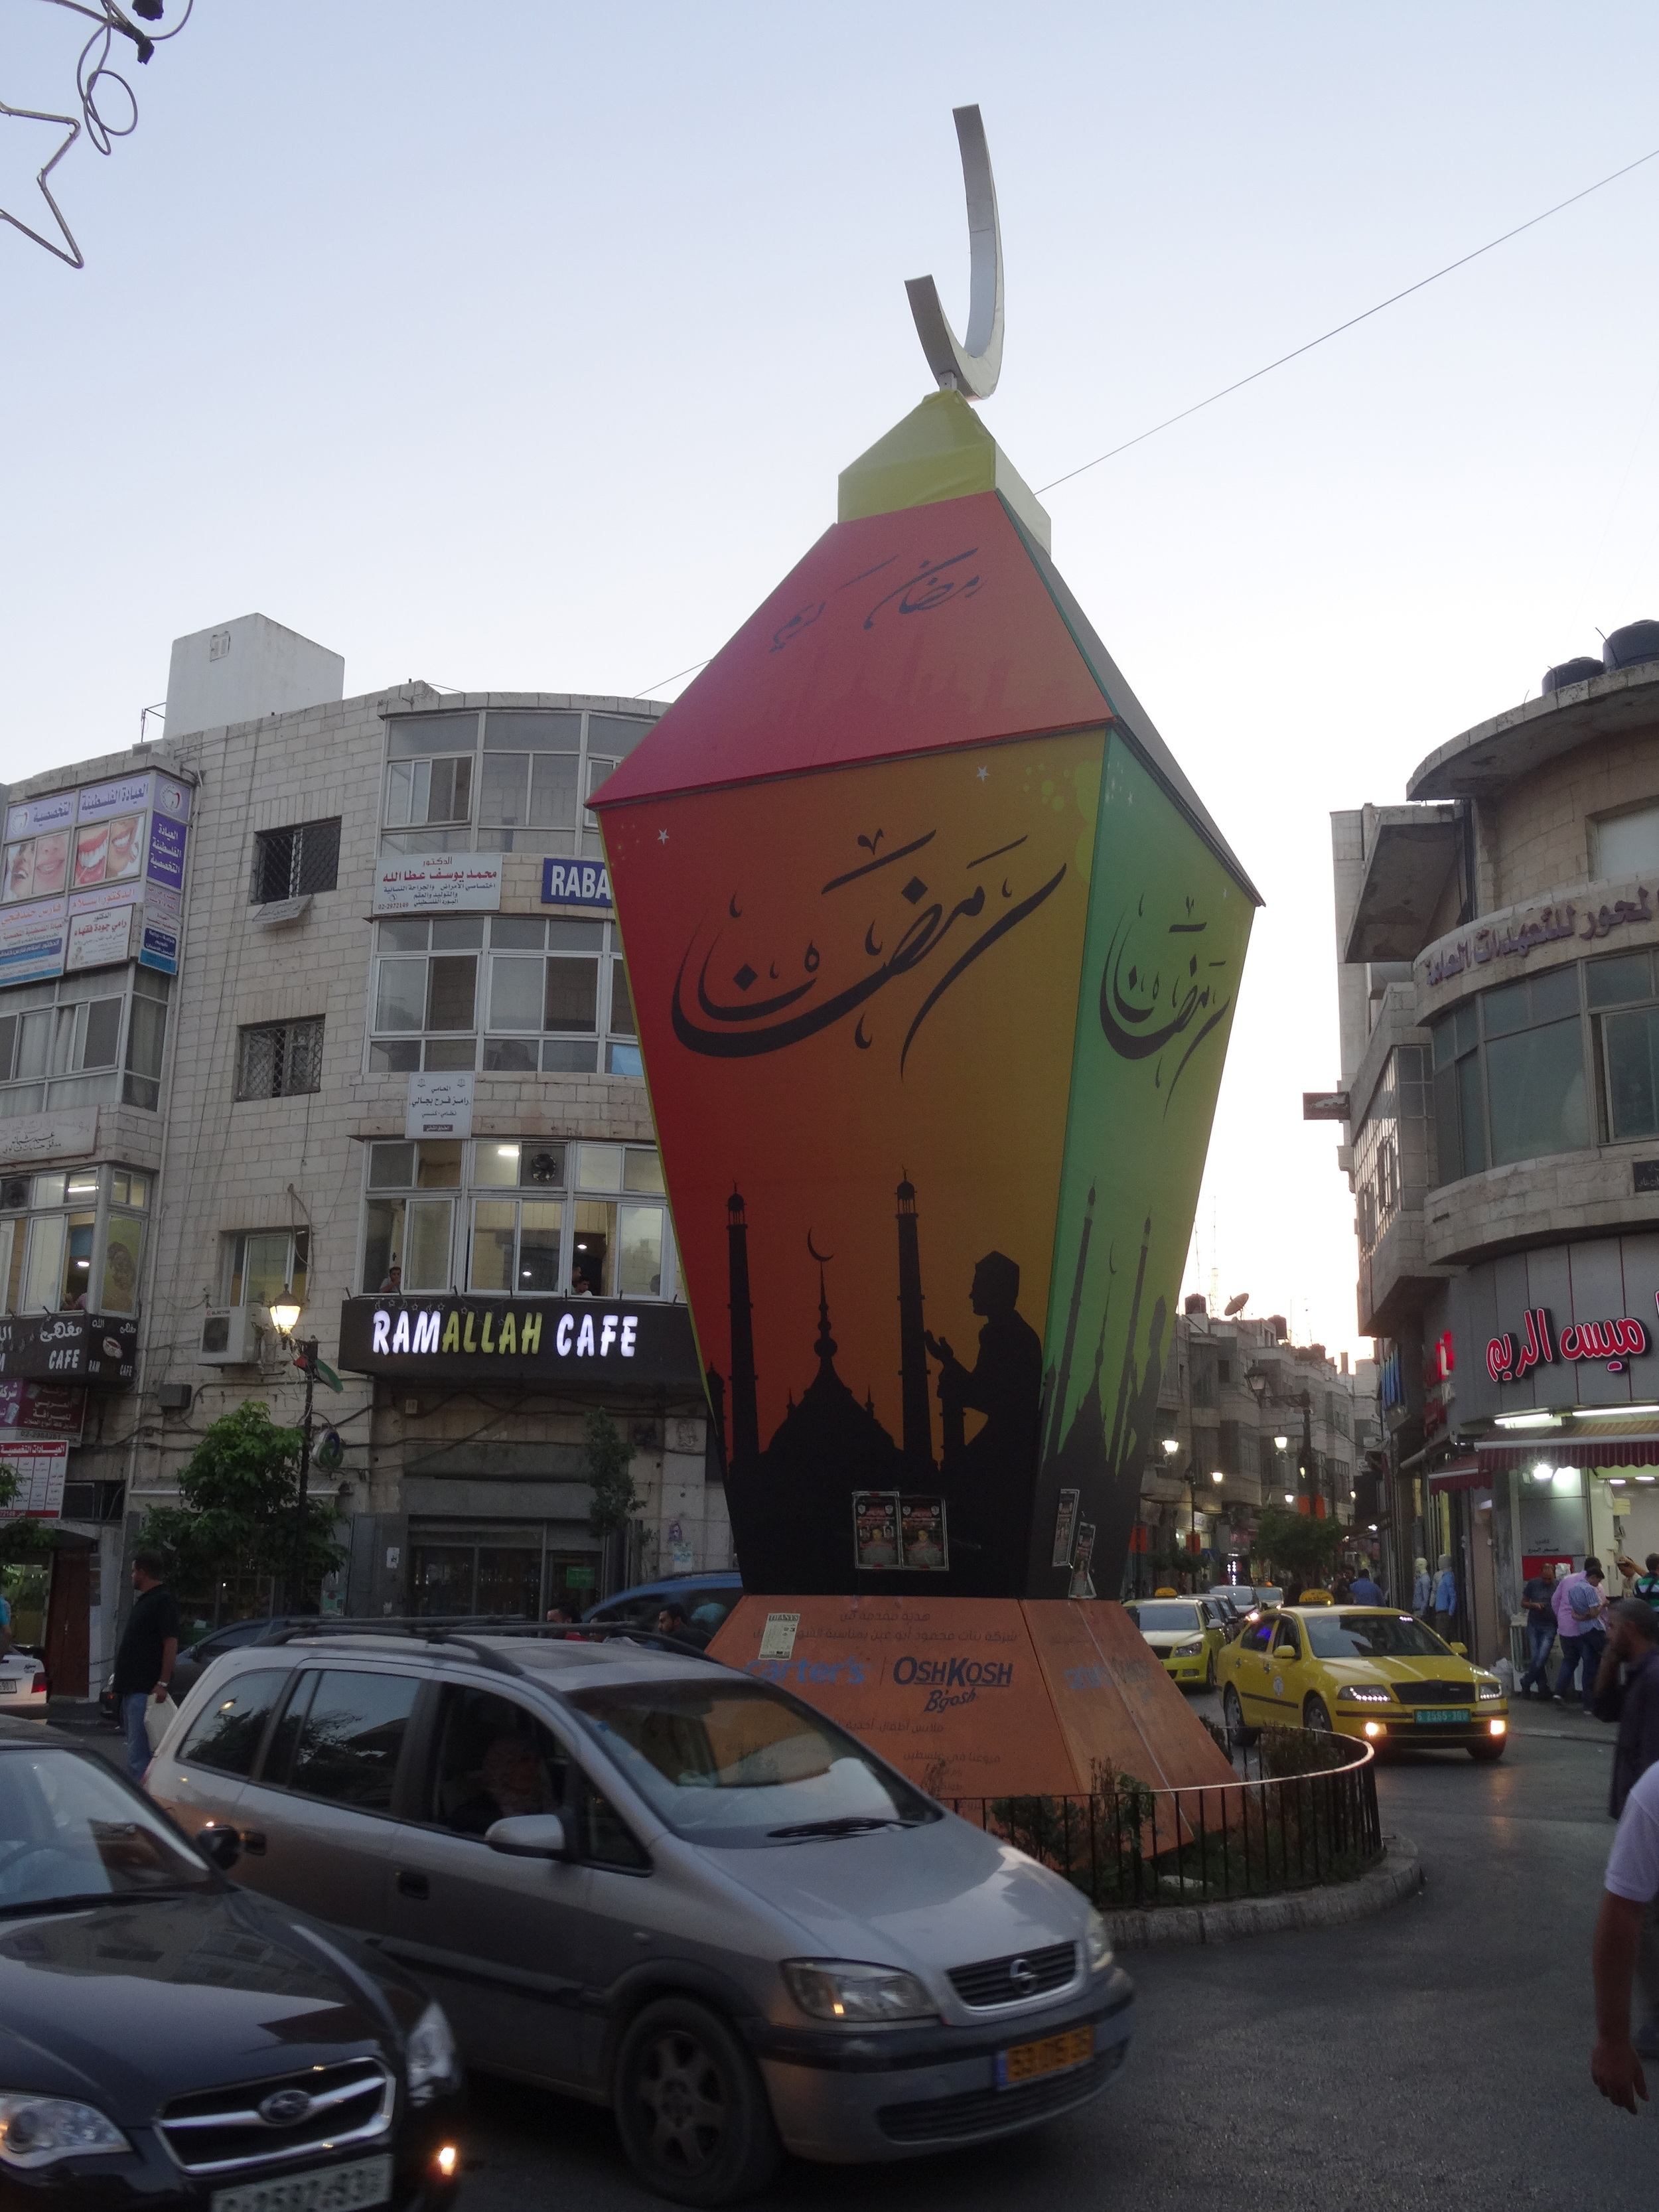 7.26.15 Ramallah, Palestine